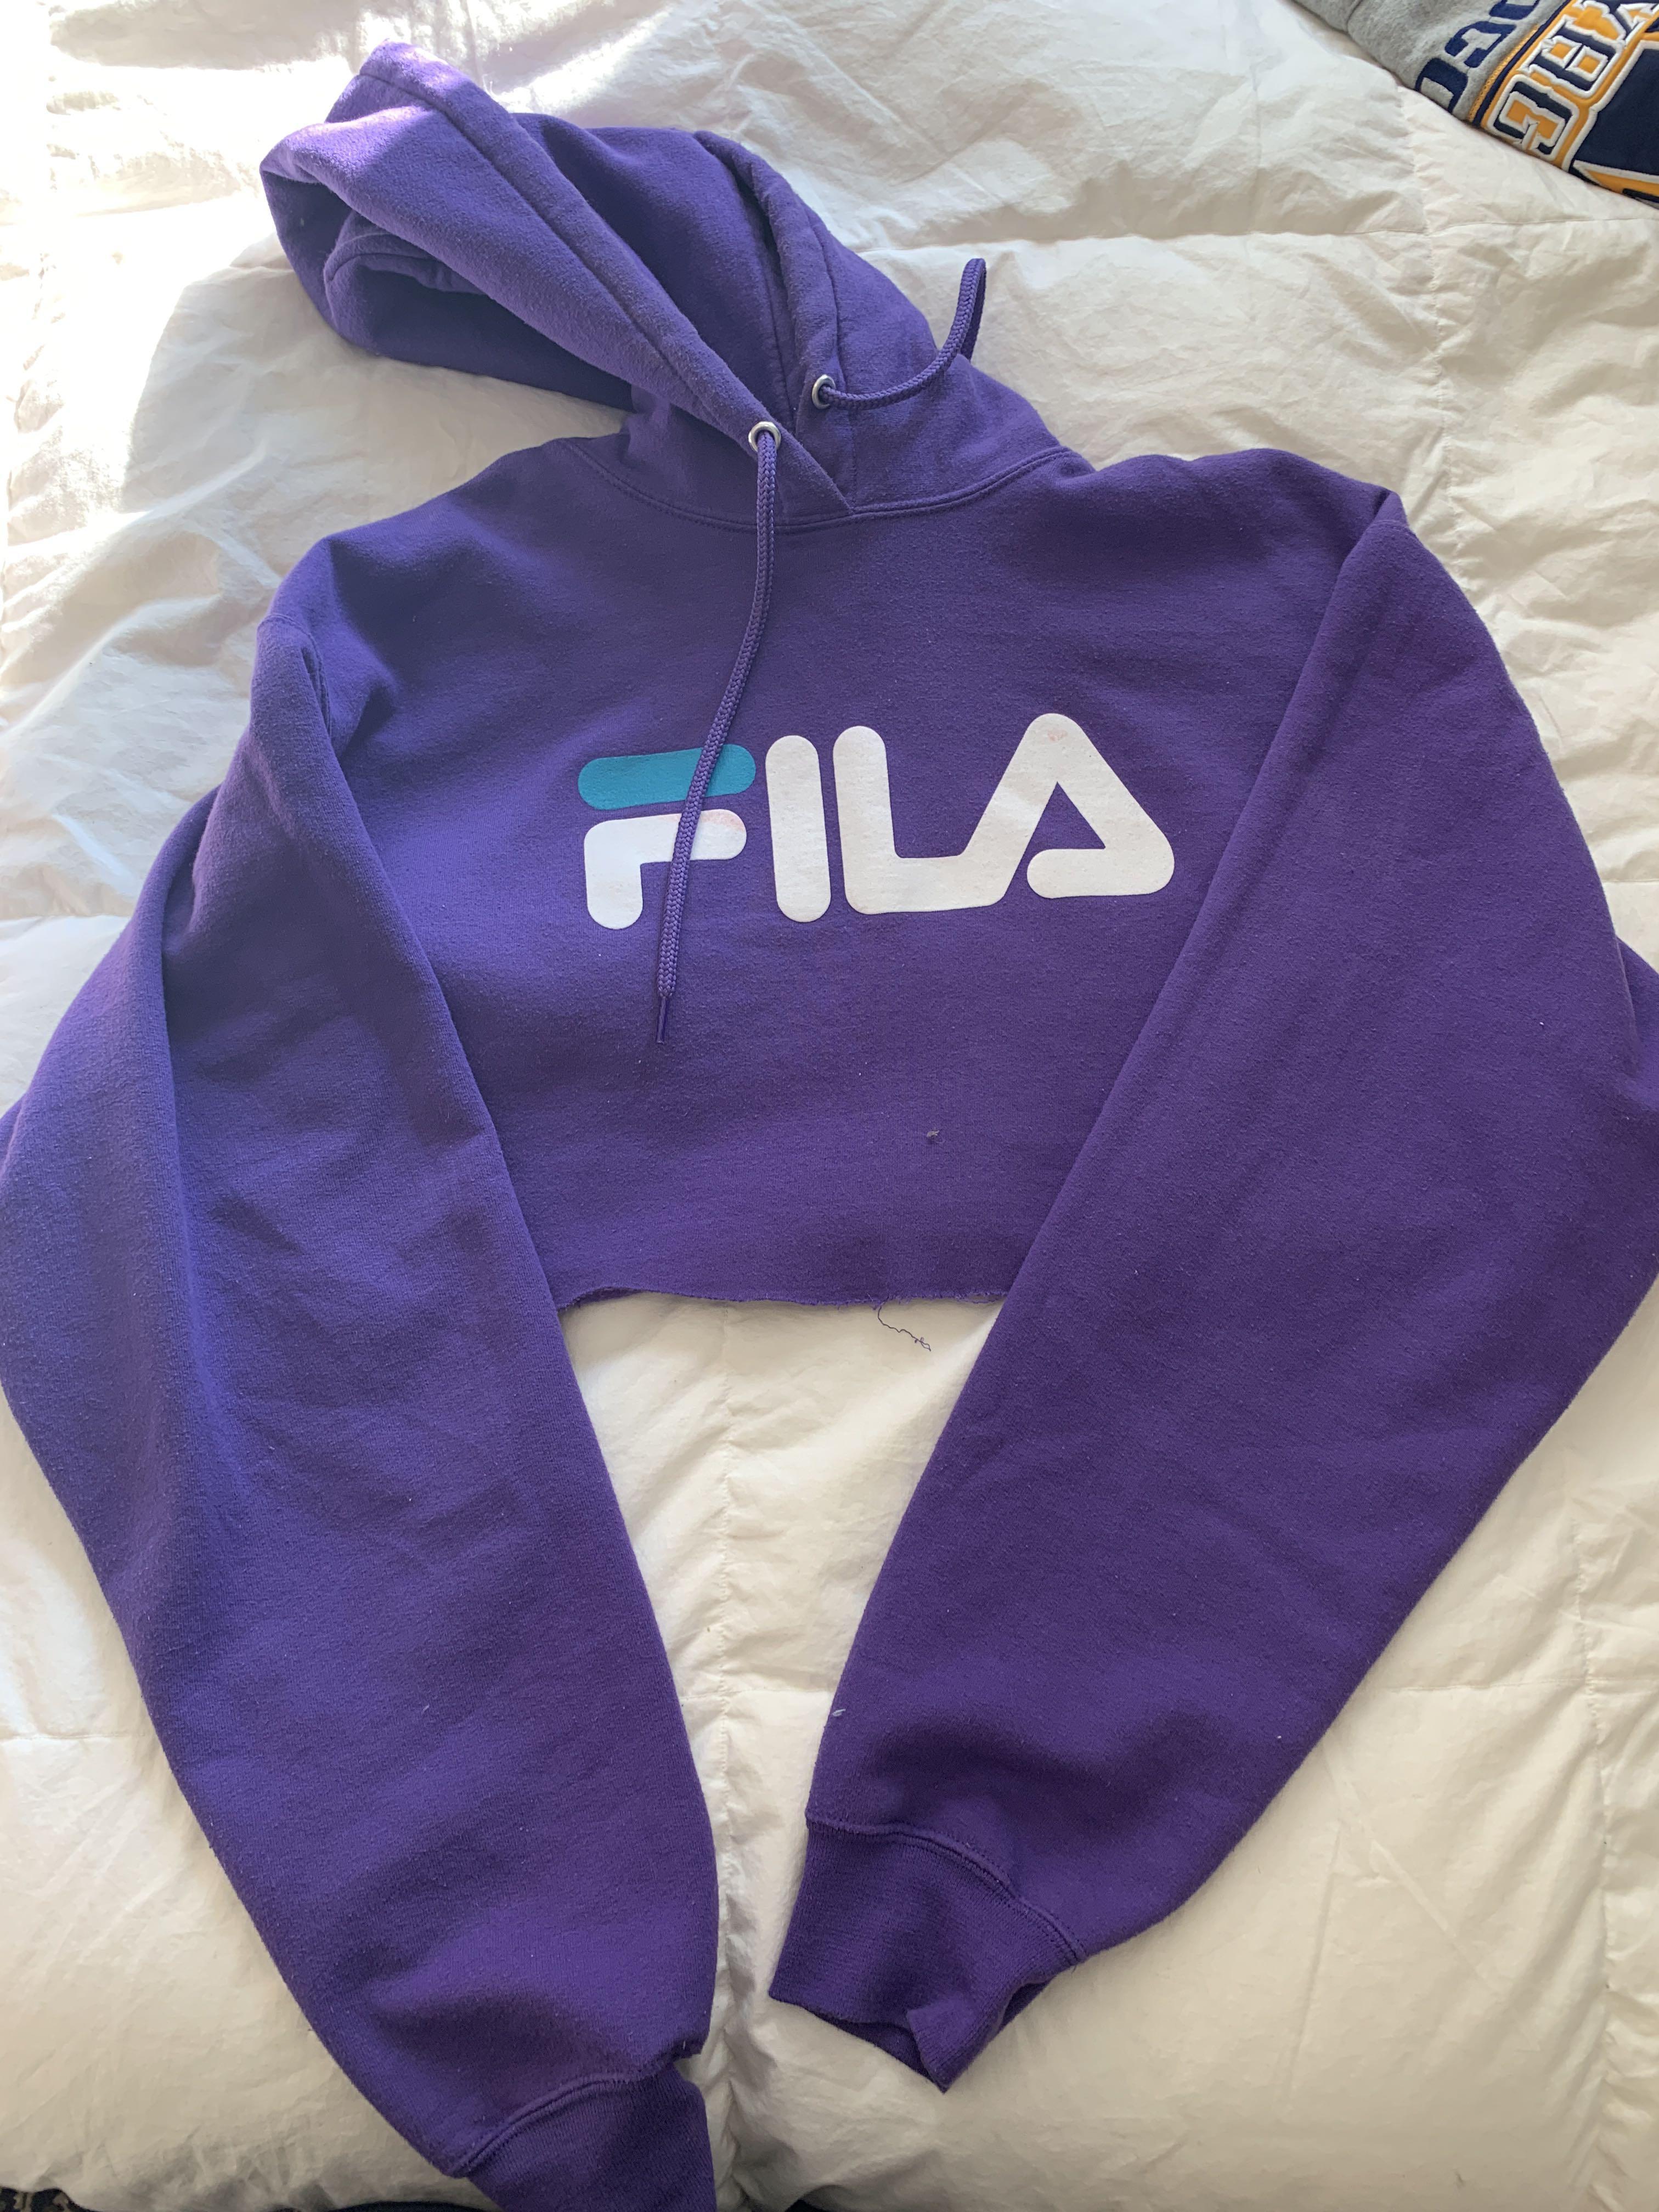 Cropped FILA sweater